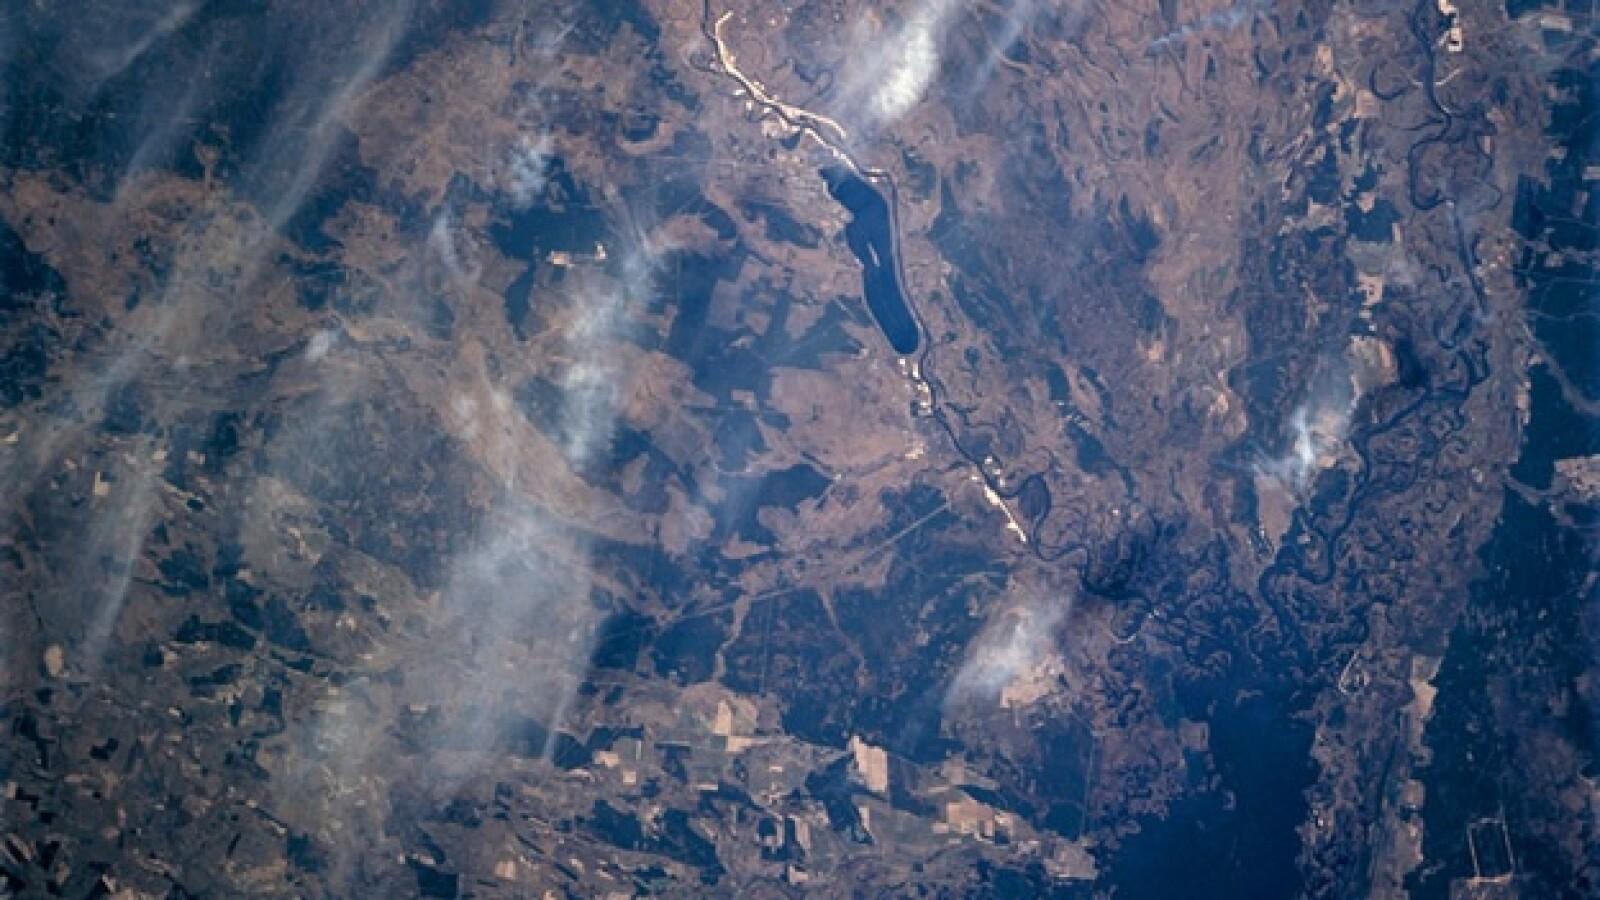 Chernóbil - vista aérea